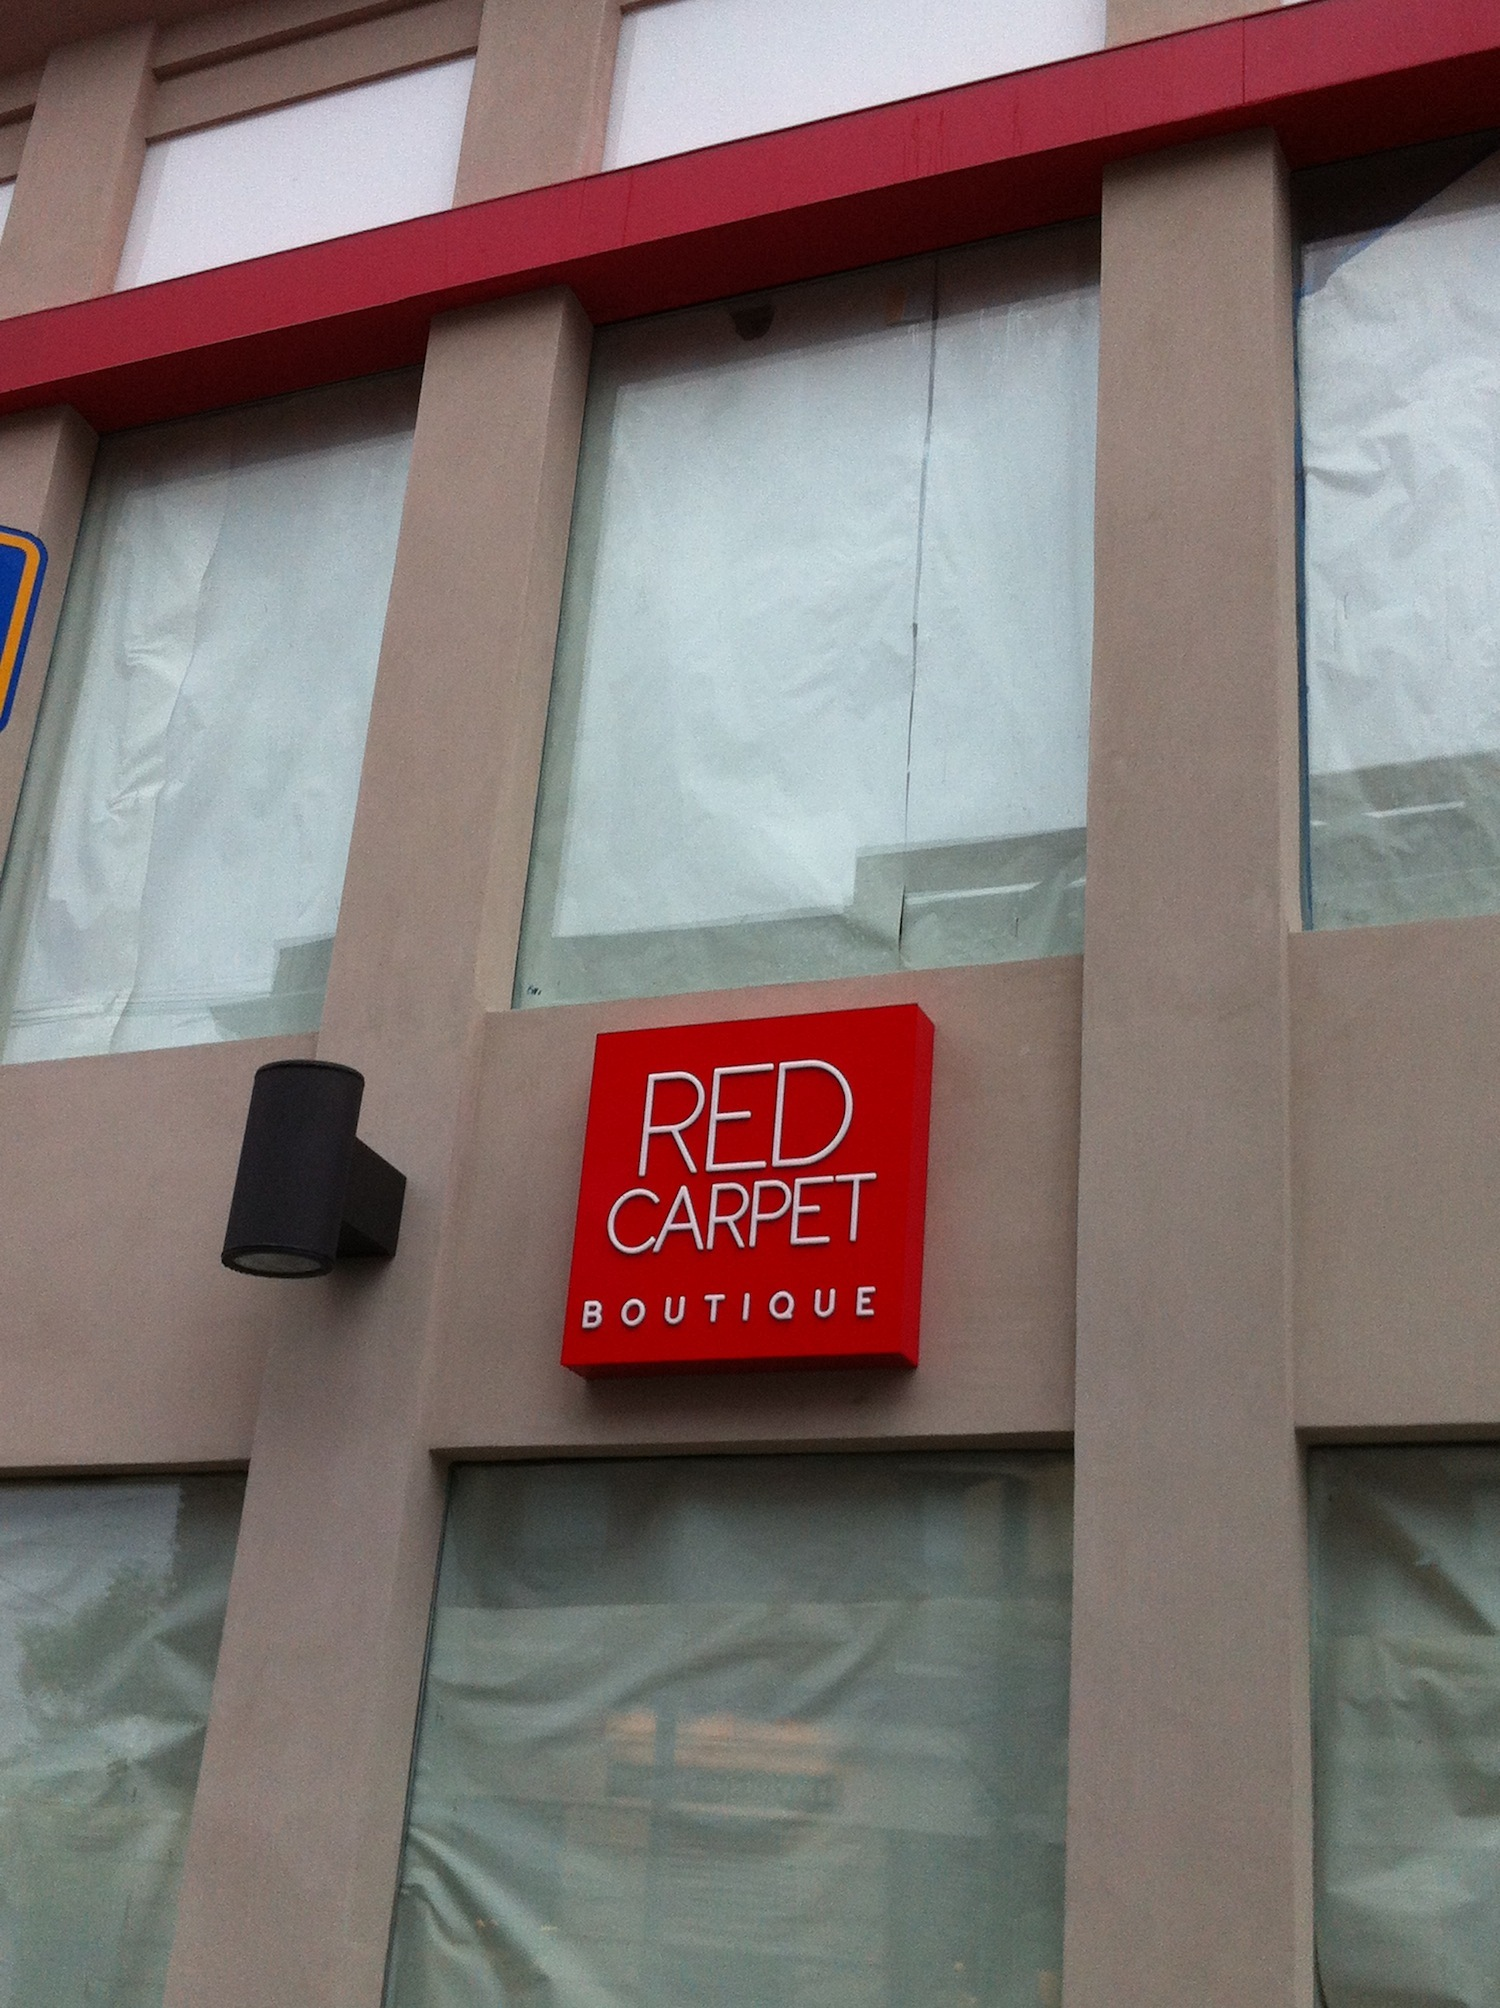 bd6684a753f59fea5c04_red_carpet_boutique.jpg